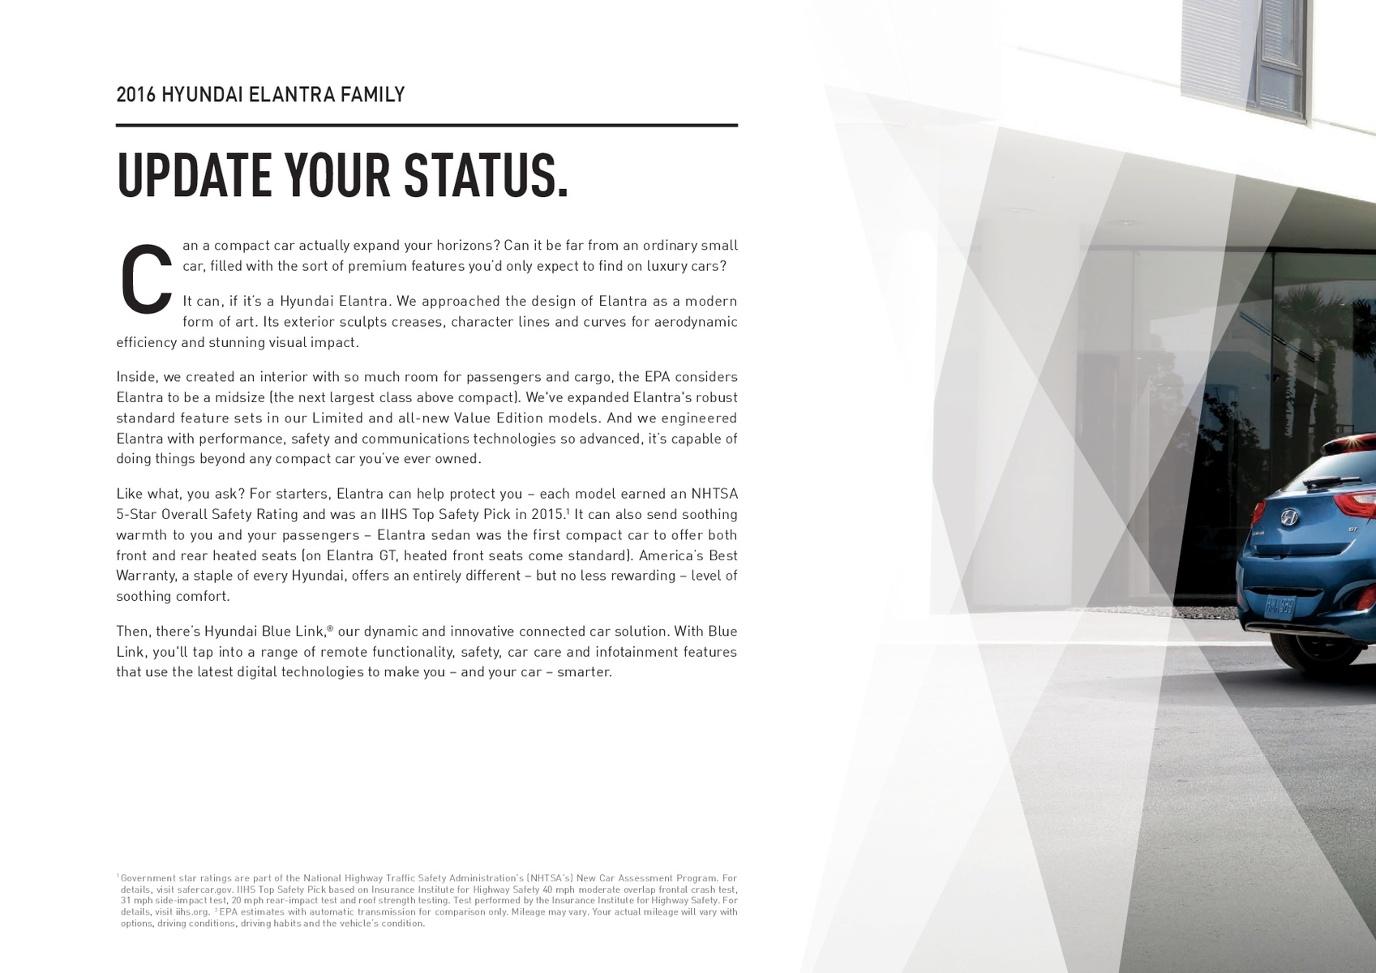 2016 Hyundai Elantra Brochure